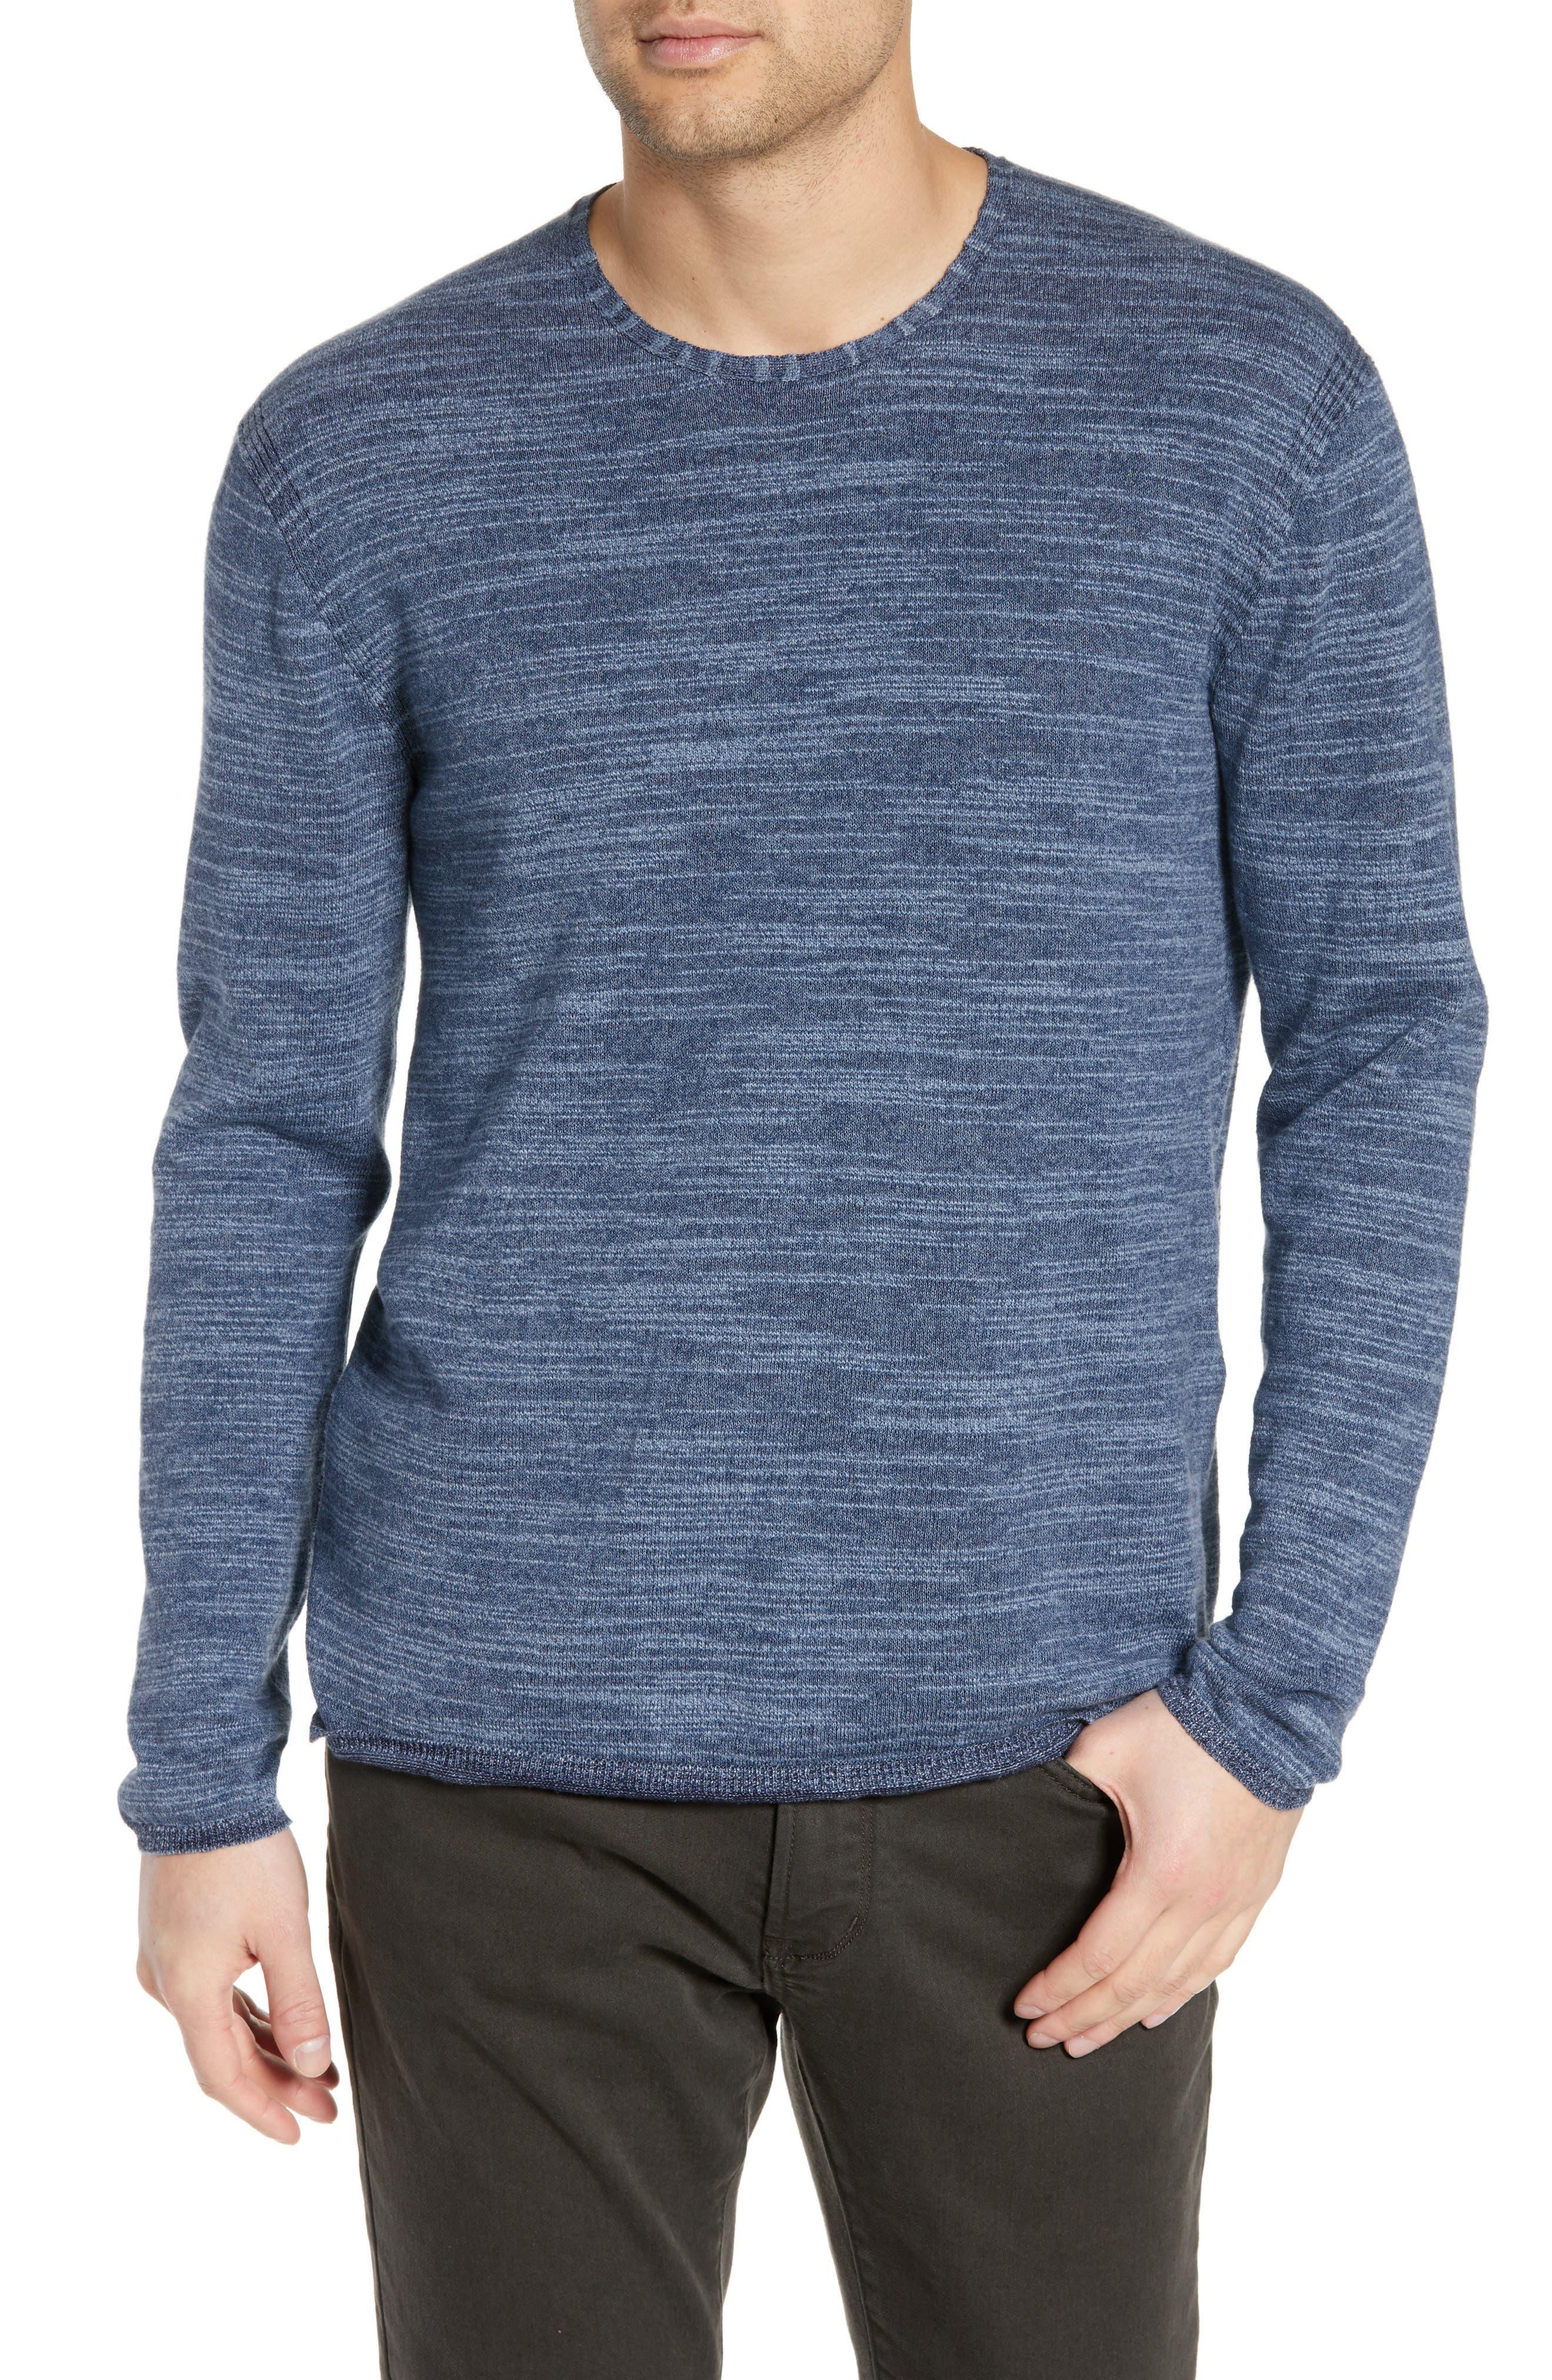 Vincent Plated Regular Fit Crewneck Sweater,                             Main thumbnail 1, color,                             STREAM BLUE